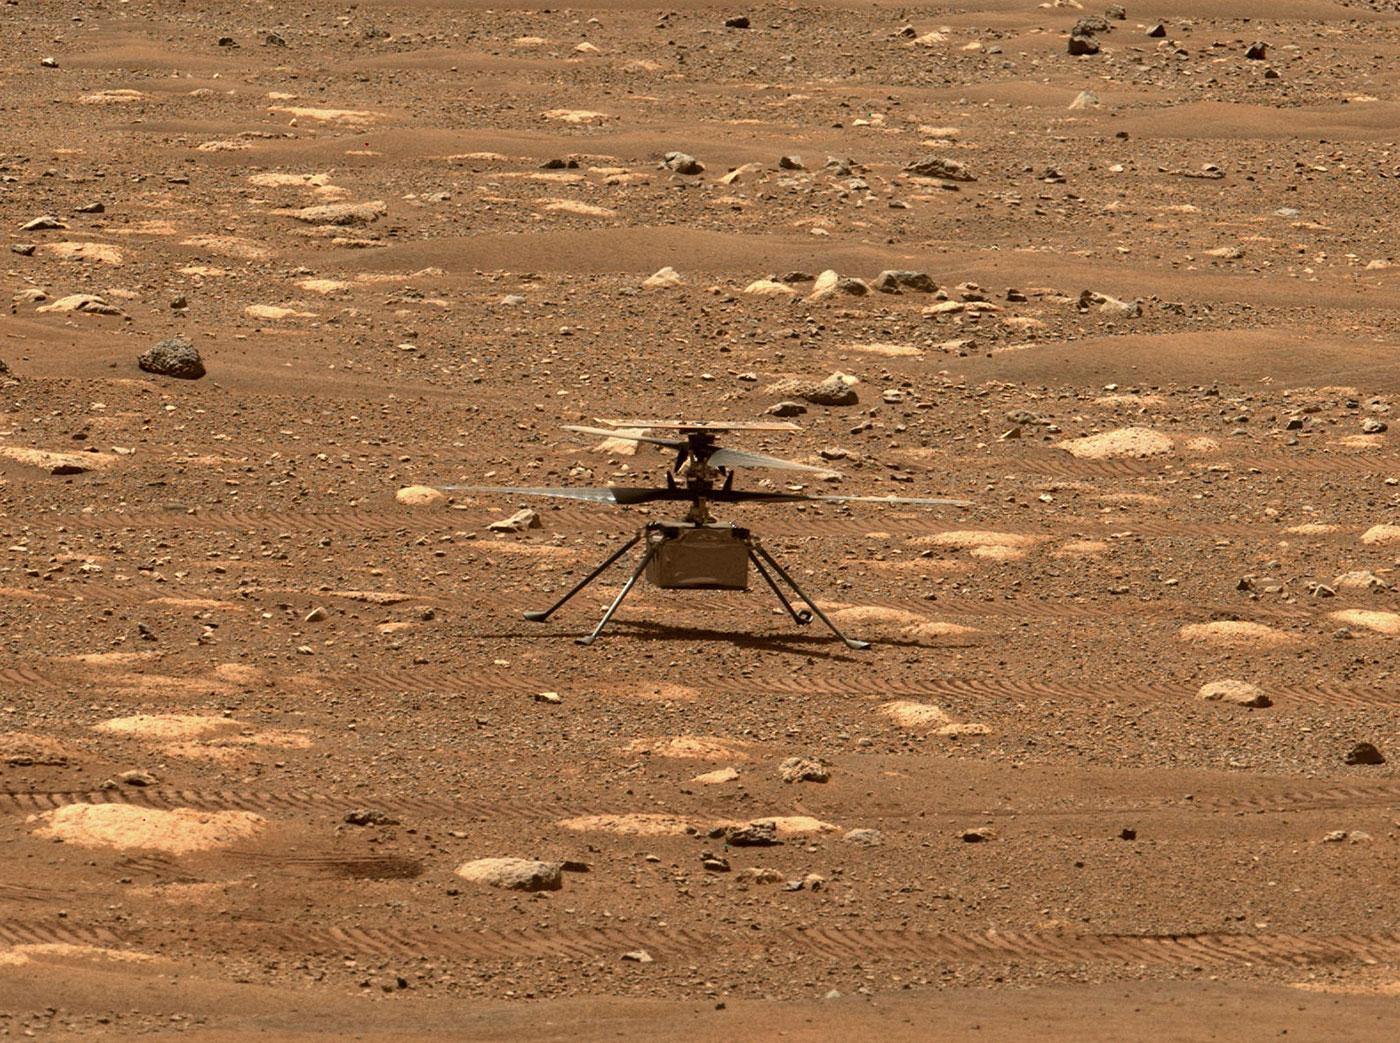 Mars Chopper Ingenuity Unlocks Rotor Blades, 1st Test Flight Delayed to NET April 14